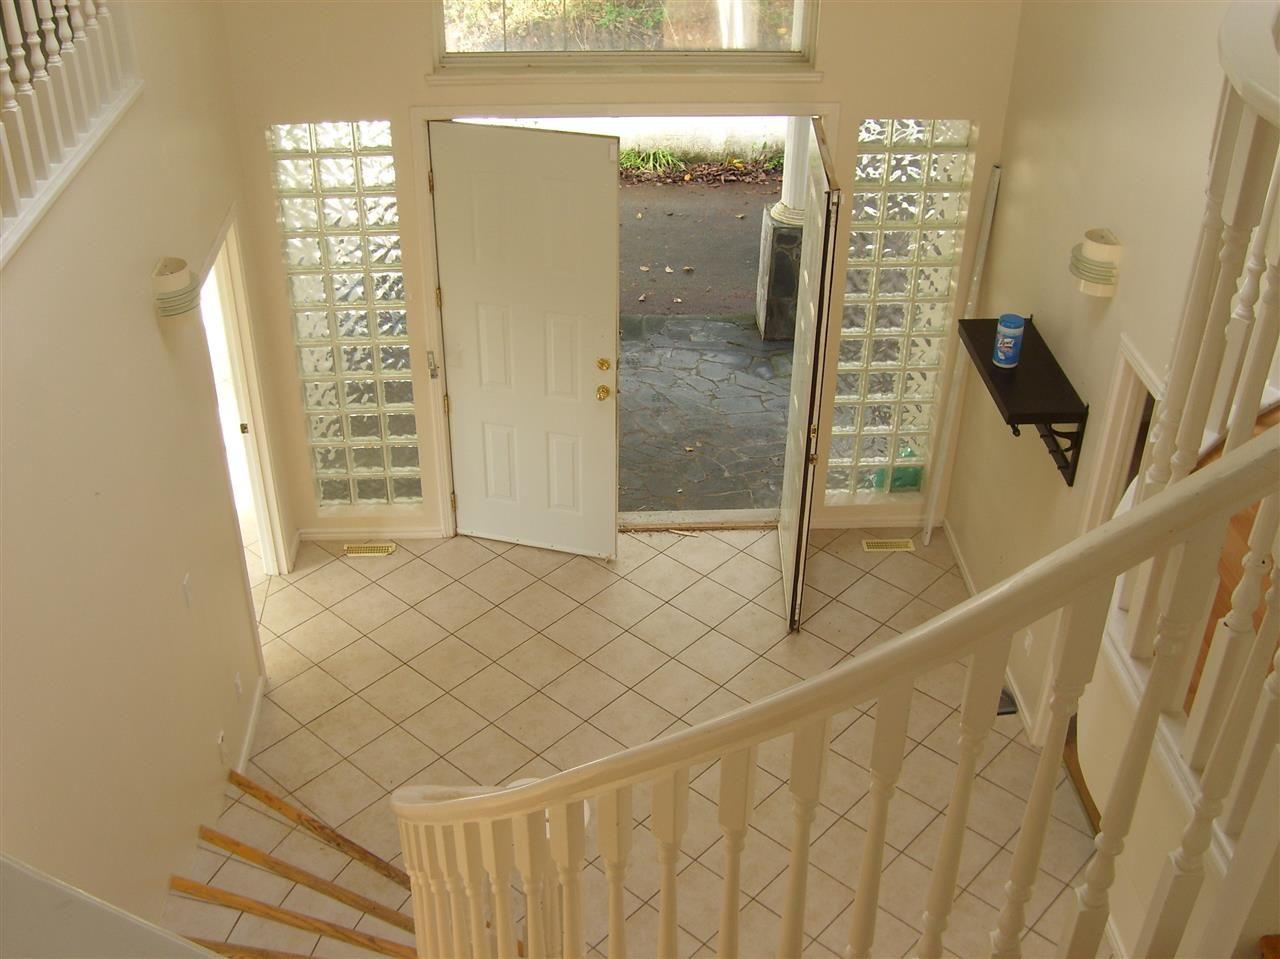 Photo 3: Photos: 28640 123 Avenue in Maple Ridge: Northeast House for sale : MLS®# R2419989